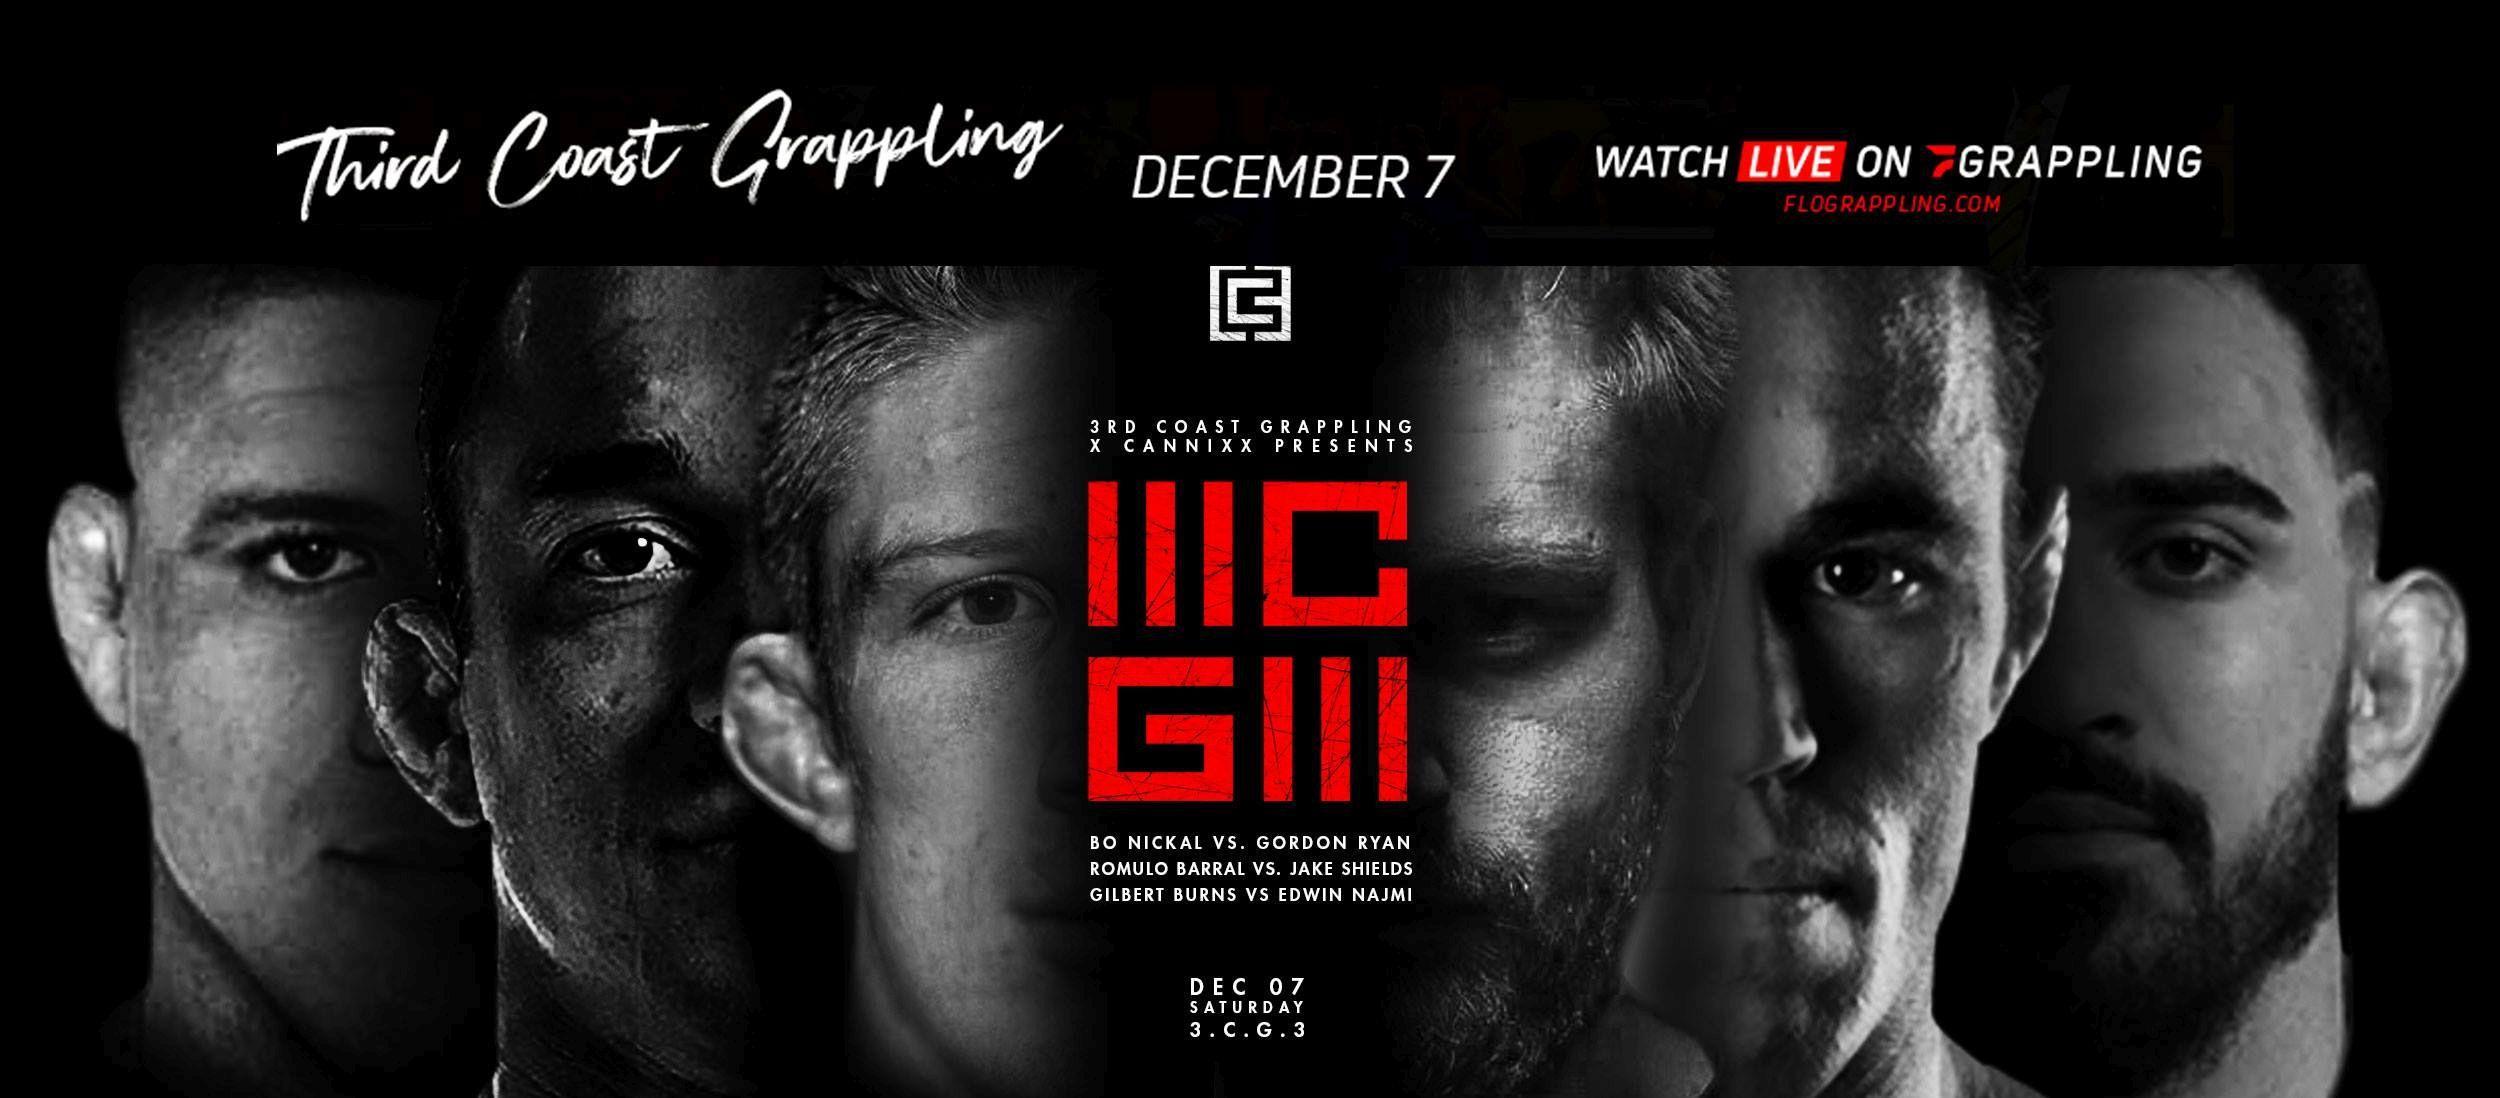 Third Coast Grappling Presents: 3CG3 Ryan vs Nickal